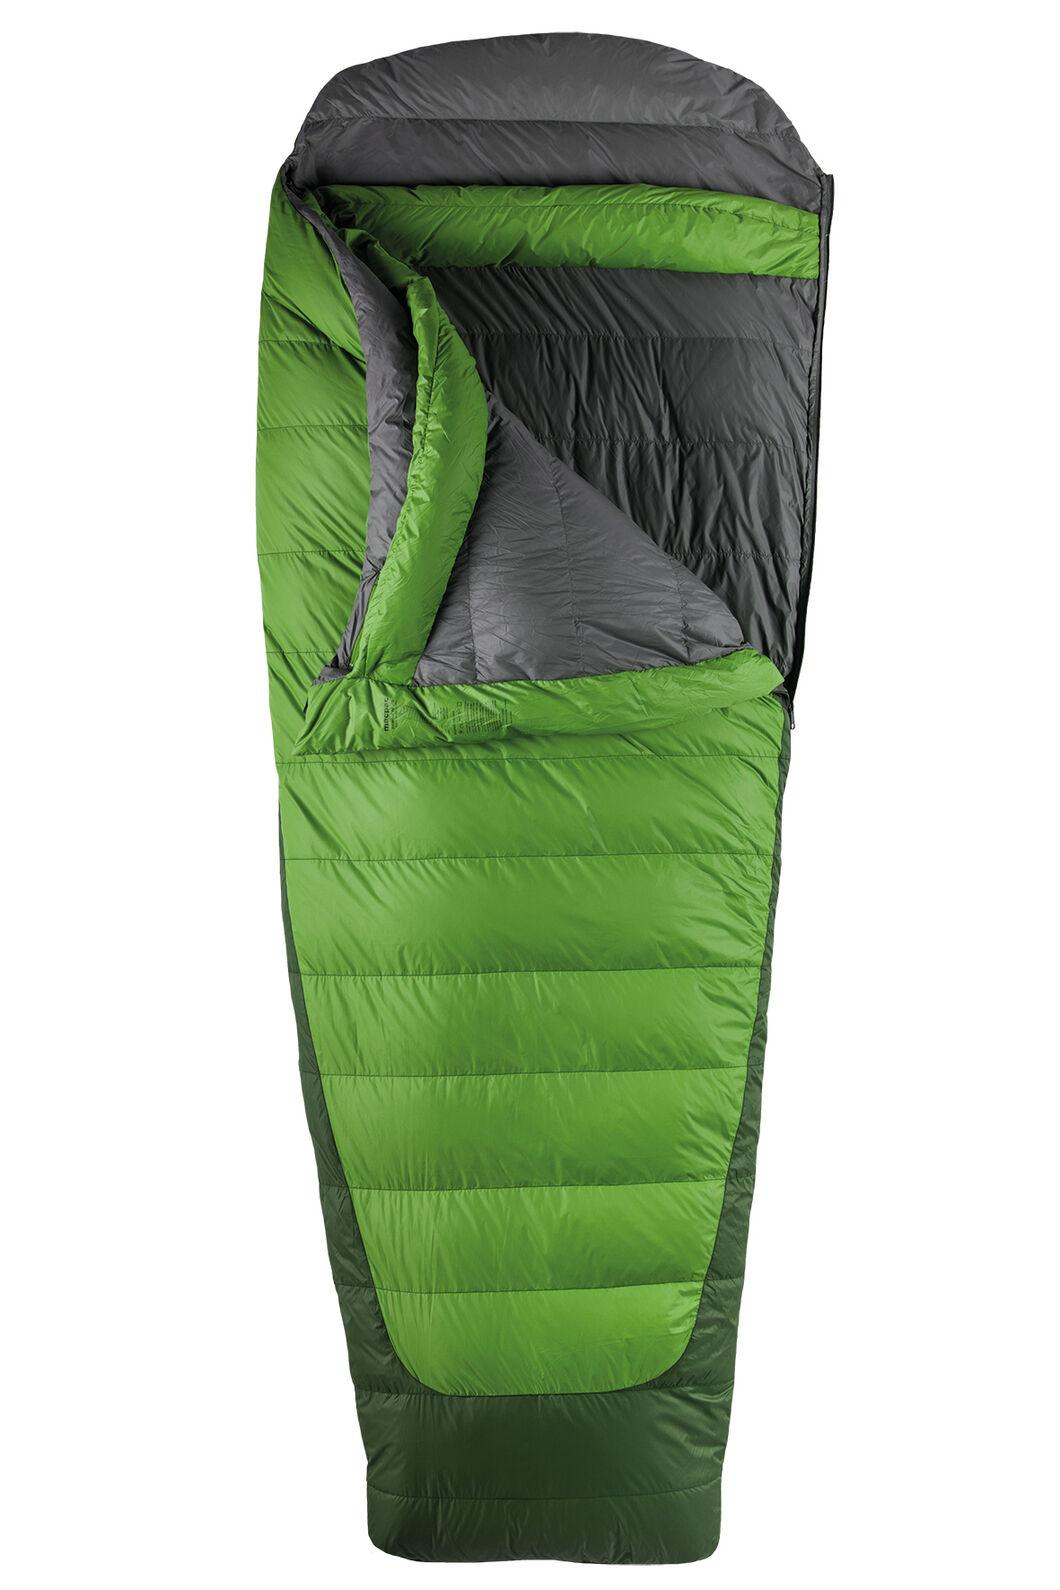 Macpac Escapade Down 500 Sleeping Bag - Standard, Kiwi, hi-res